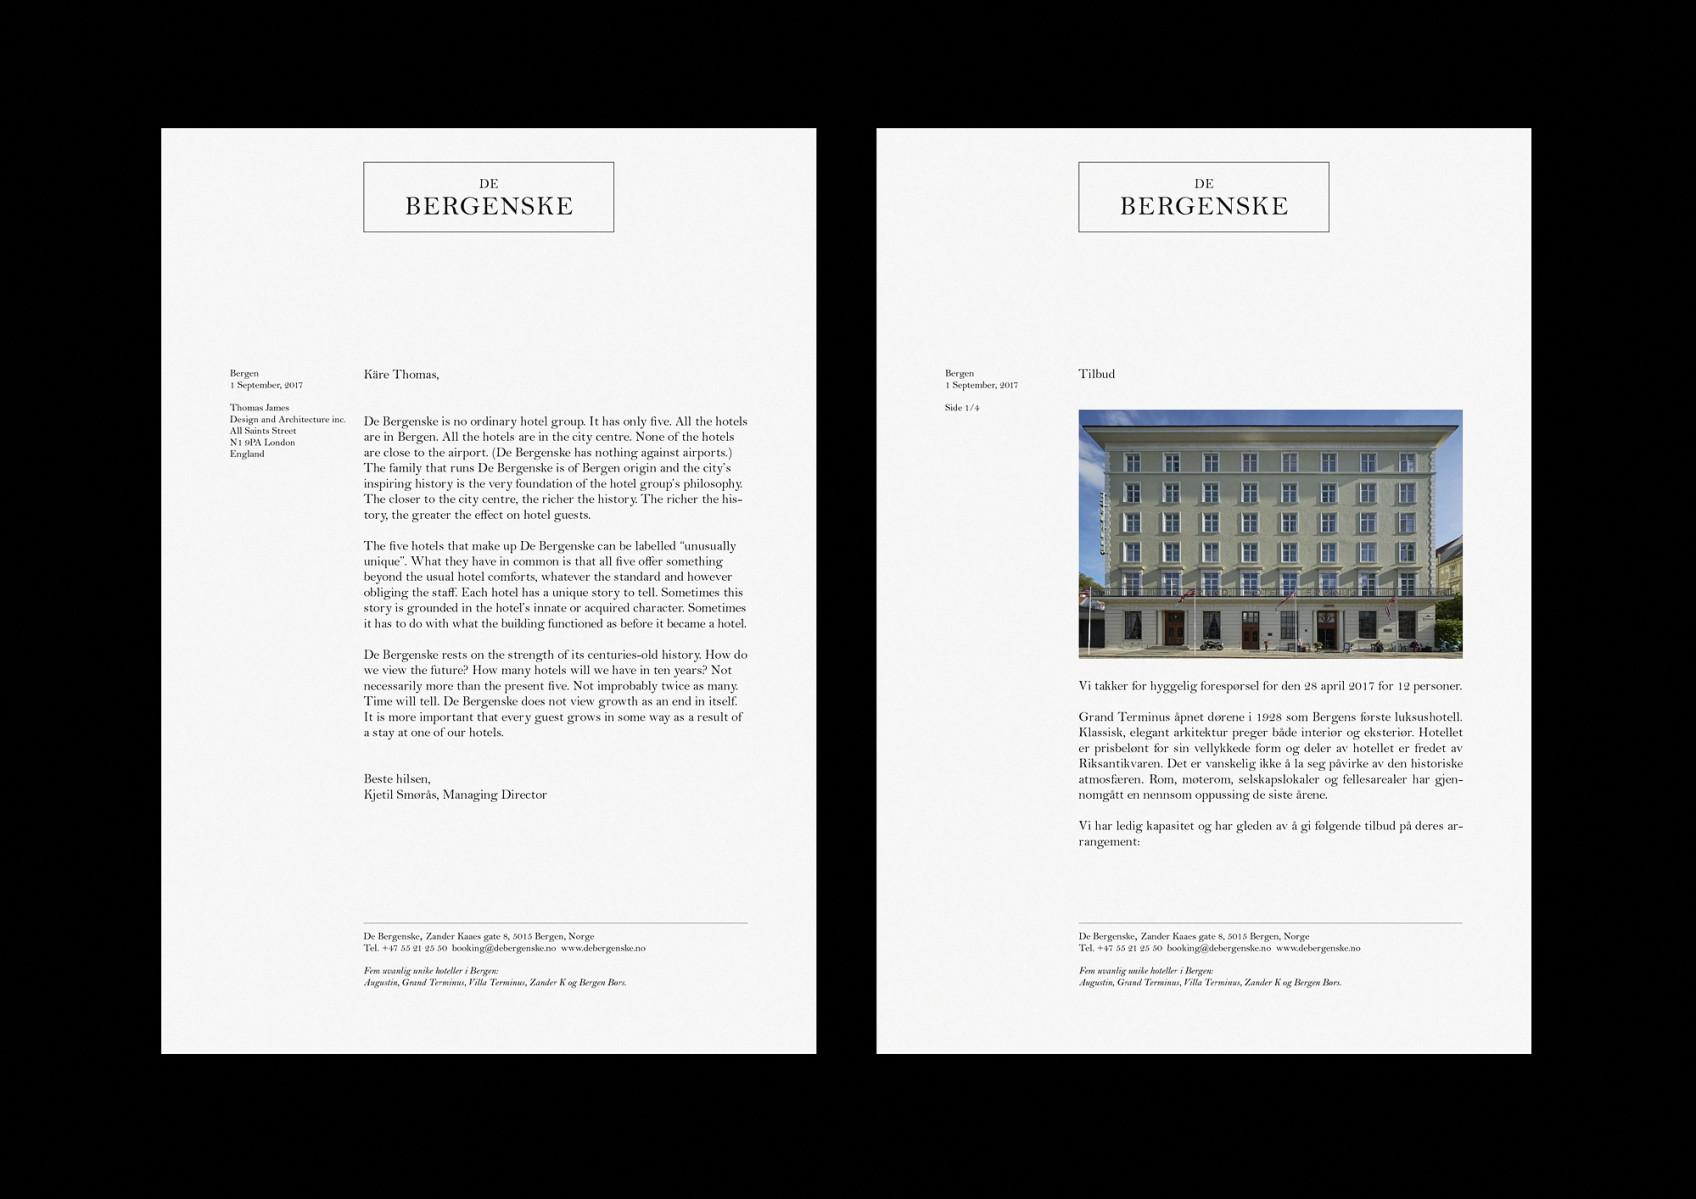 Henrik nygrendesign identity in collaboration with claesson koivisto rune 201617 falaconquin